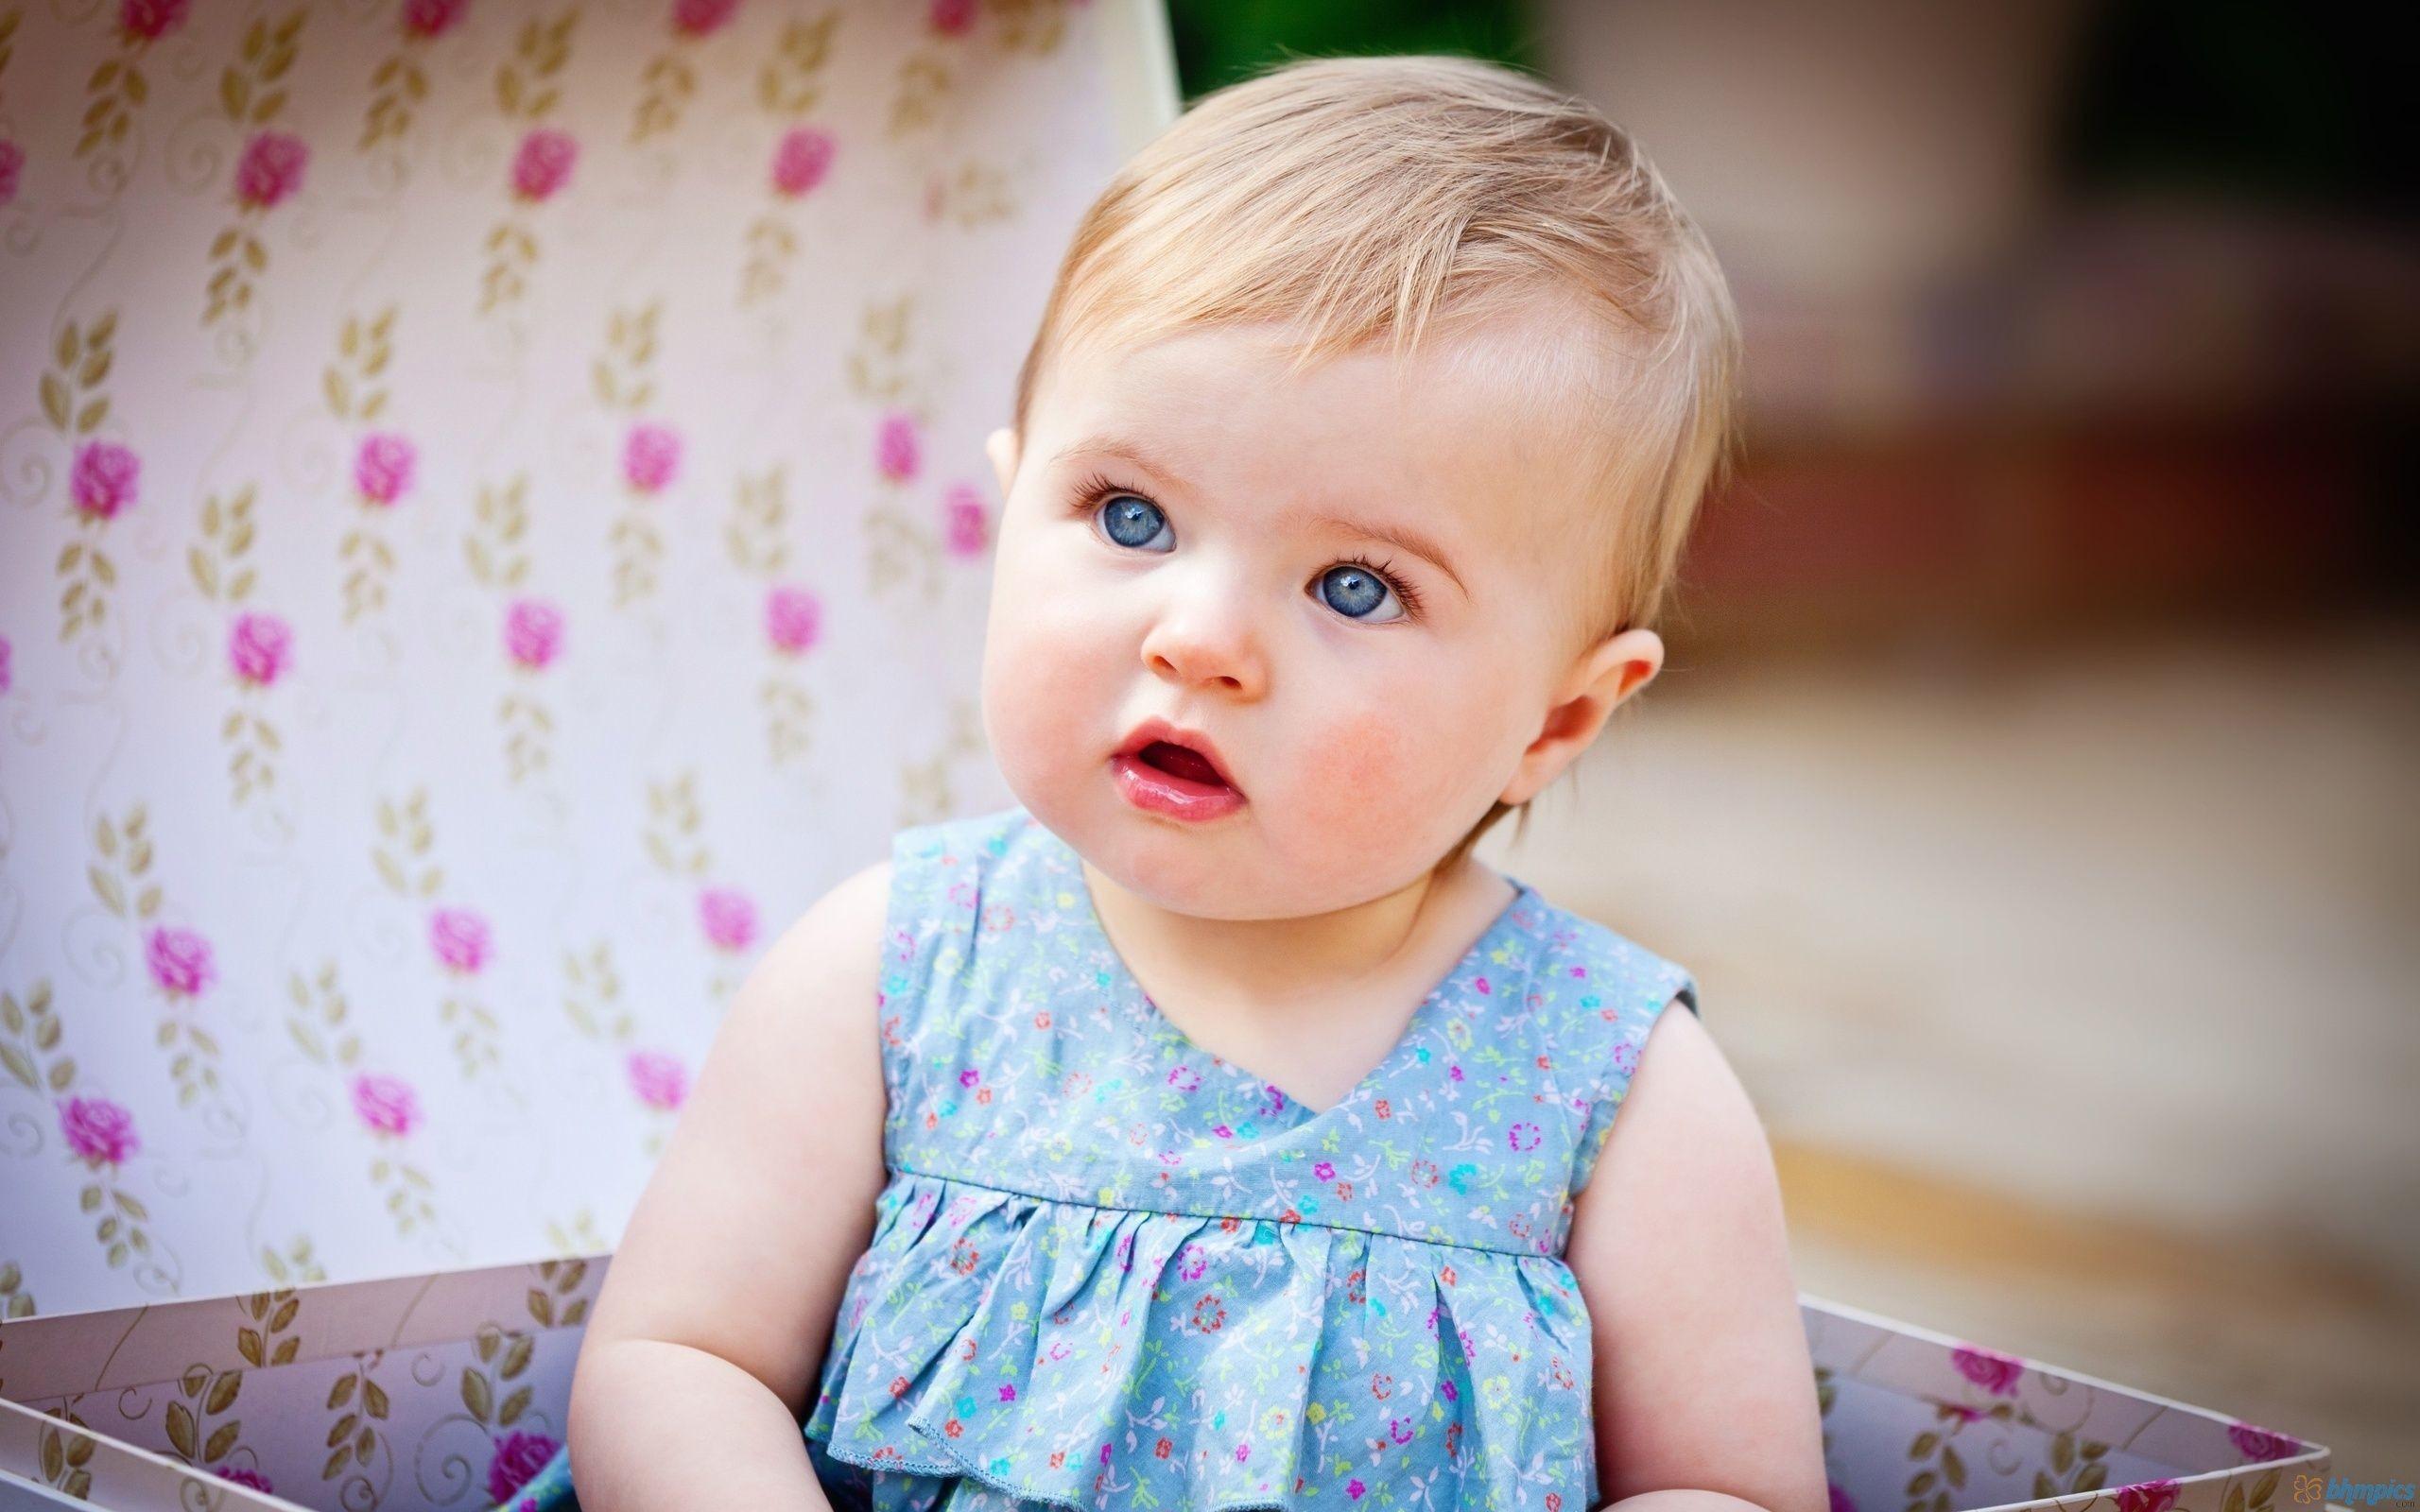 Cute Baby Girl Wallpaper & its Cute Girl Free Desktop Wallppaer HD